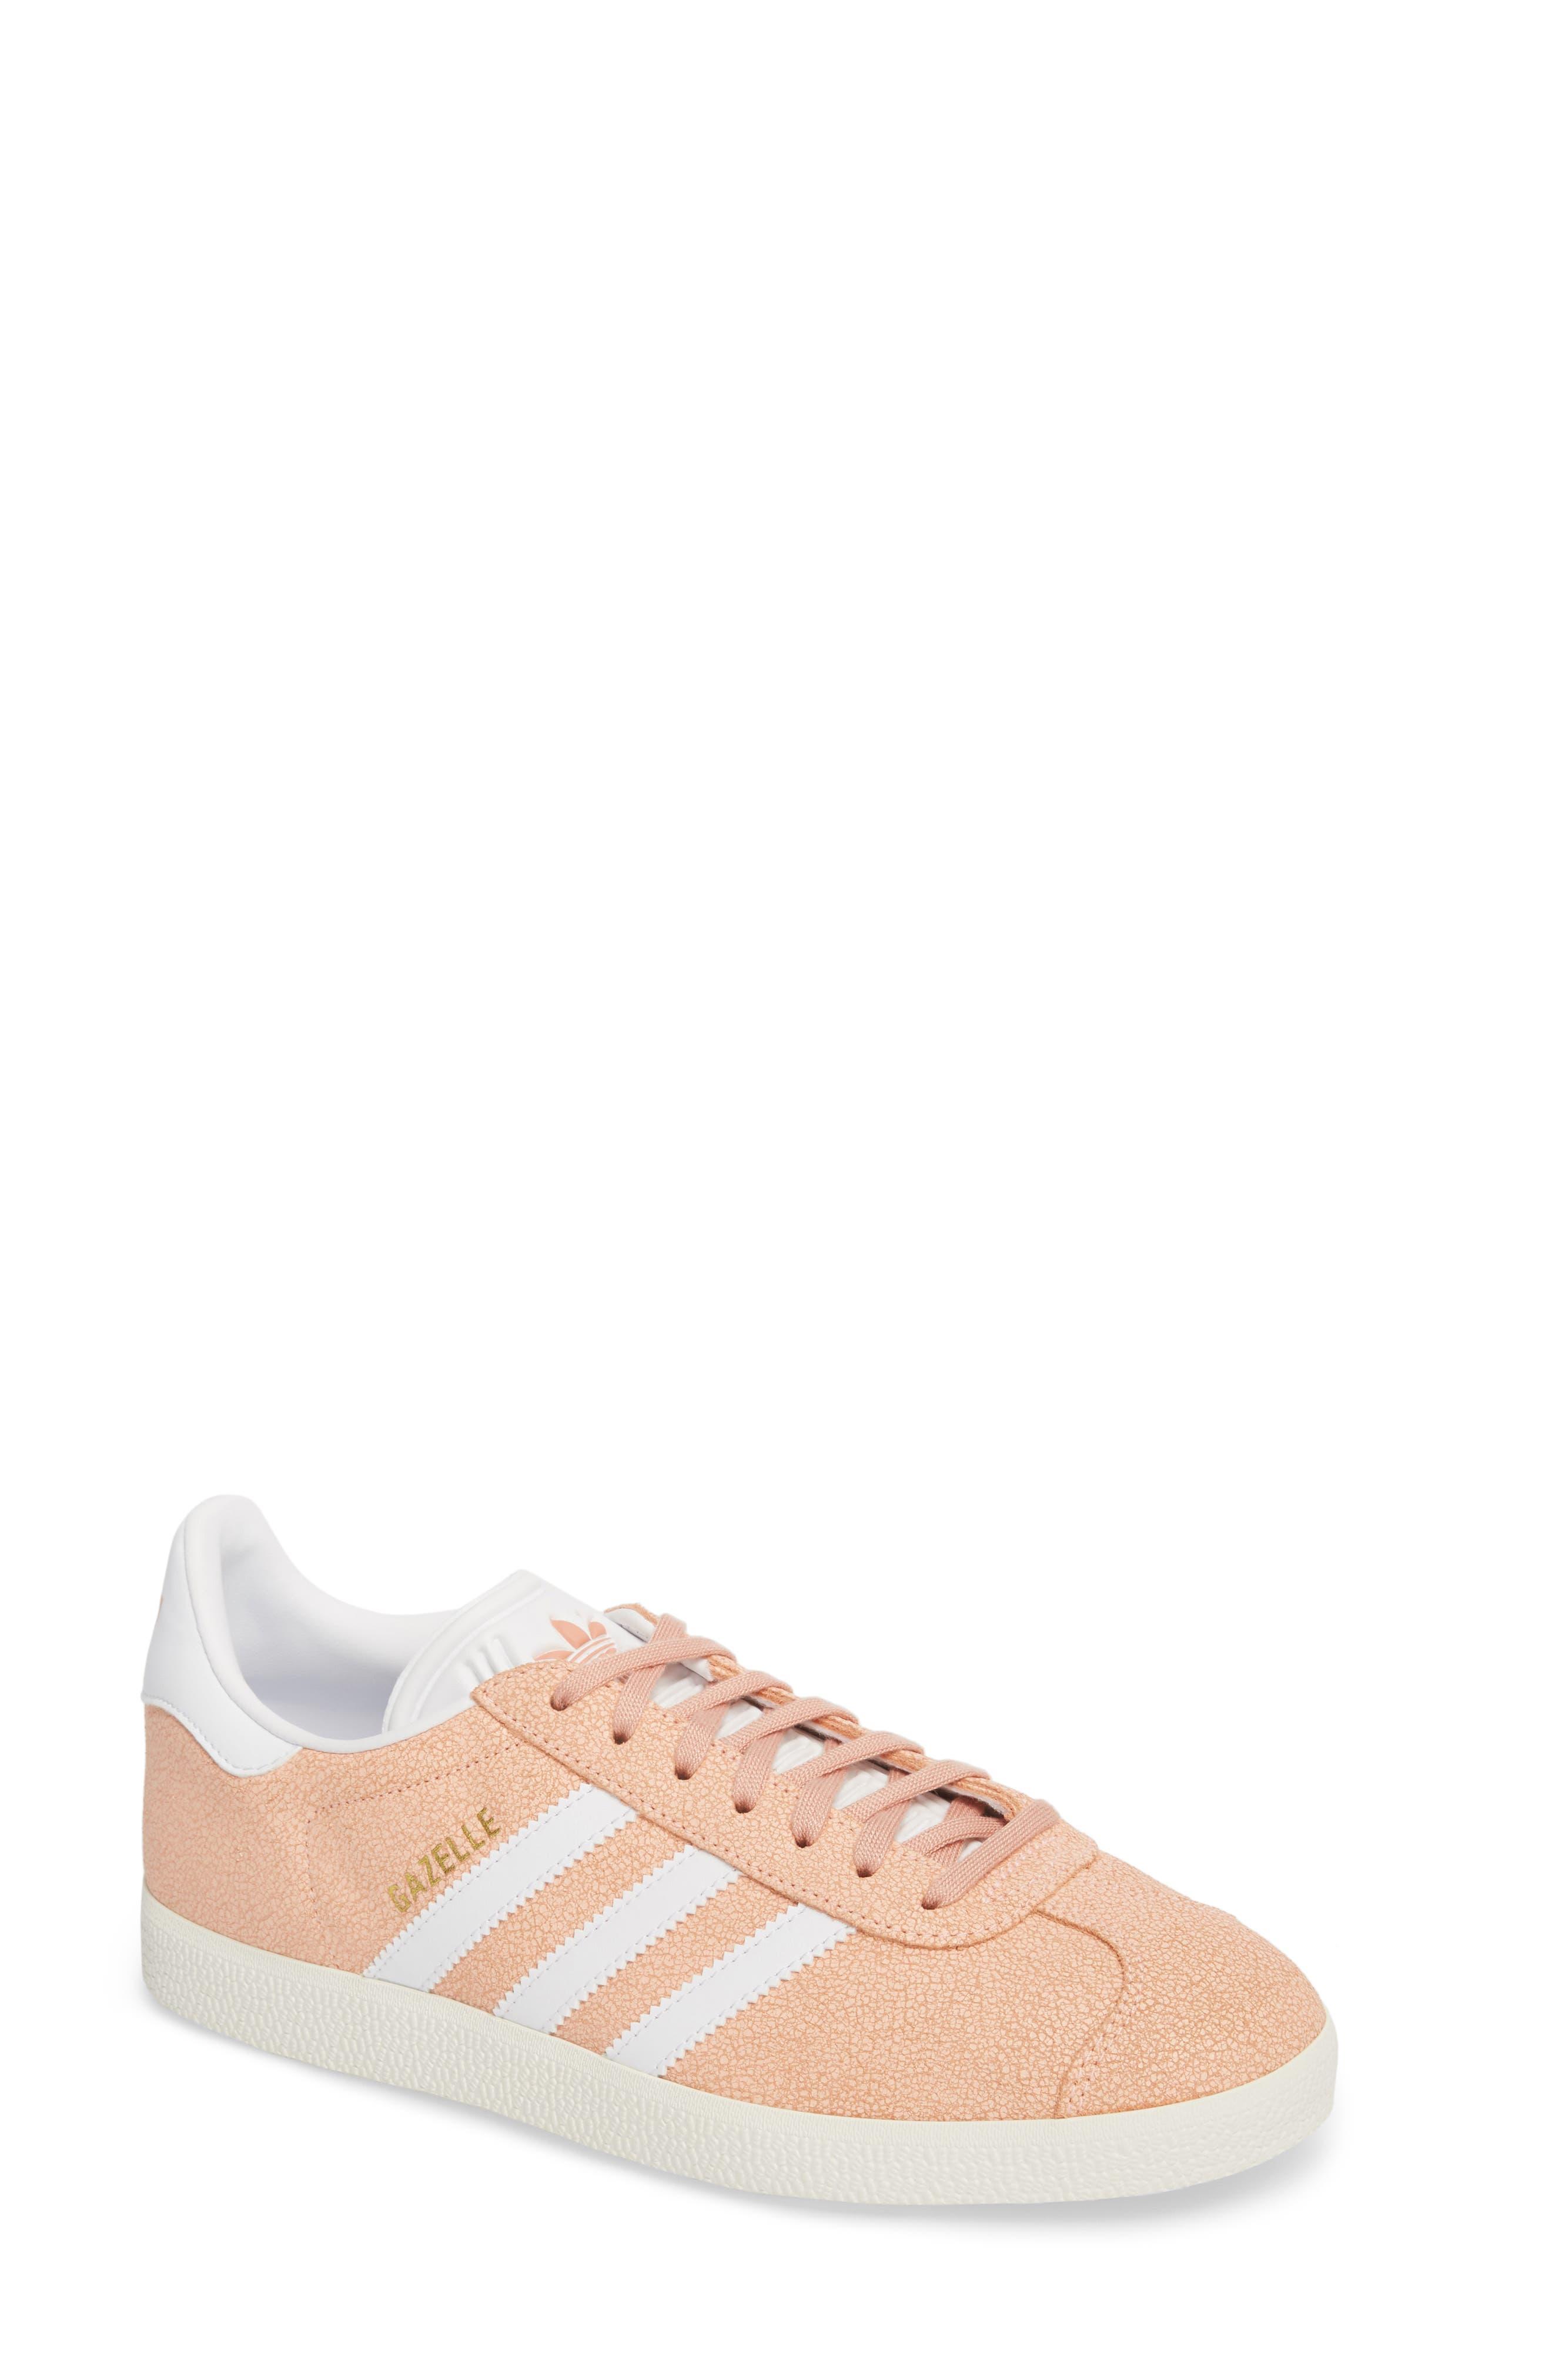 Gazelle Sneaker,                             Main thumbnail 1, color,                             Clear Orange/ White/ Off White